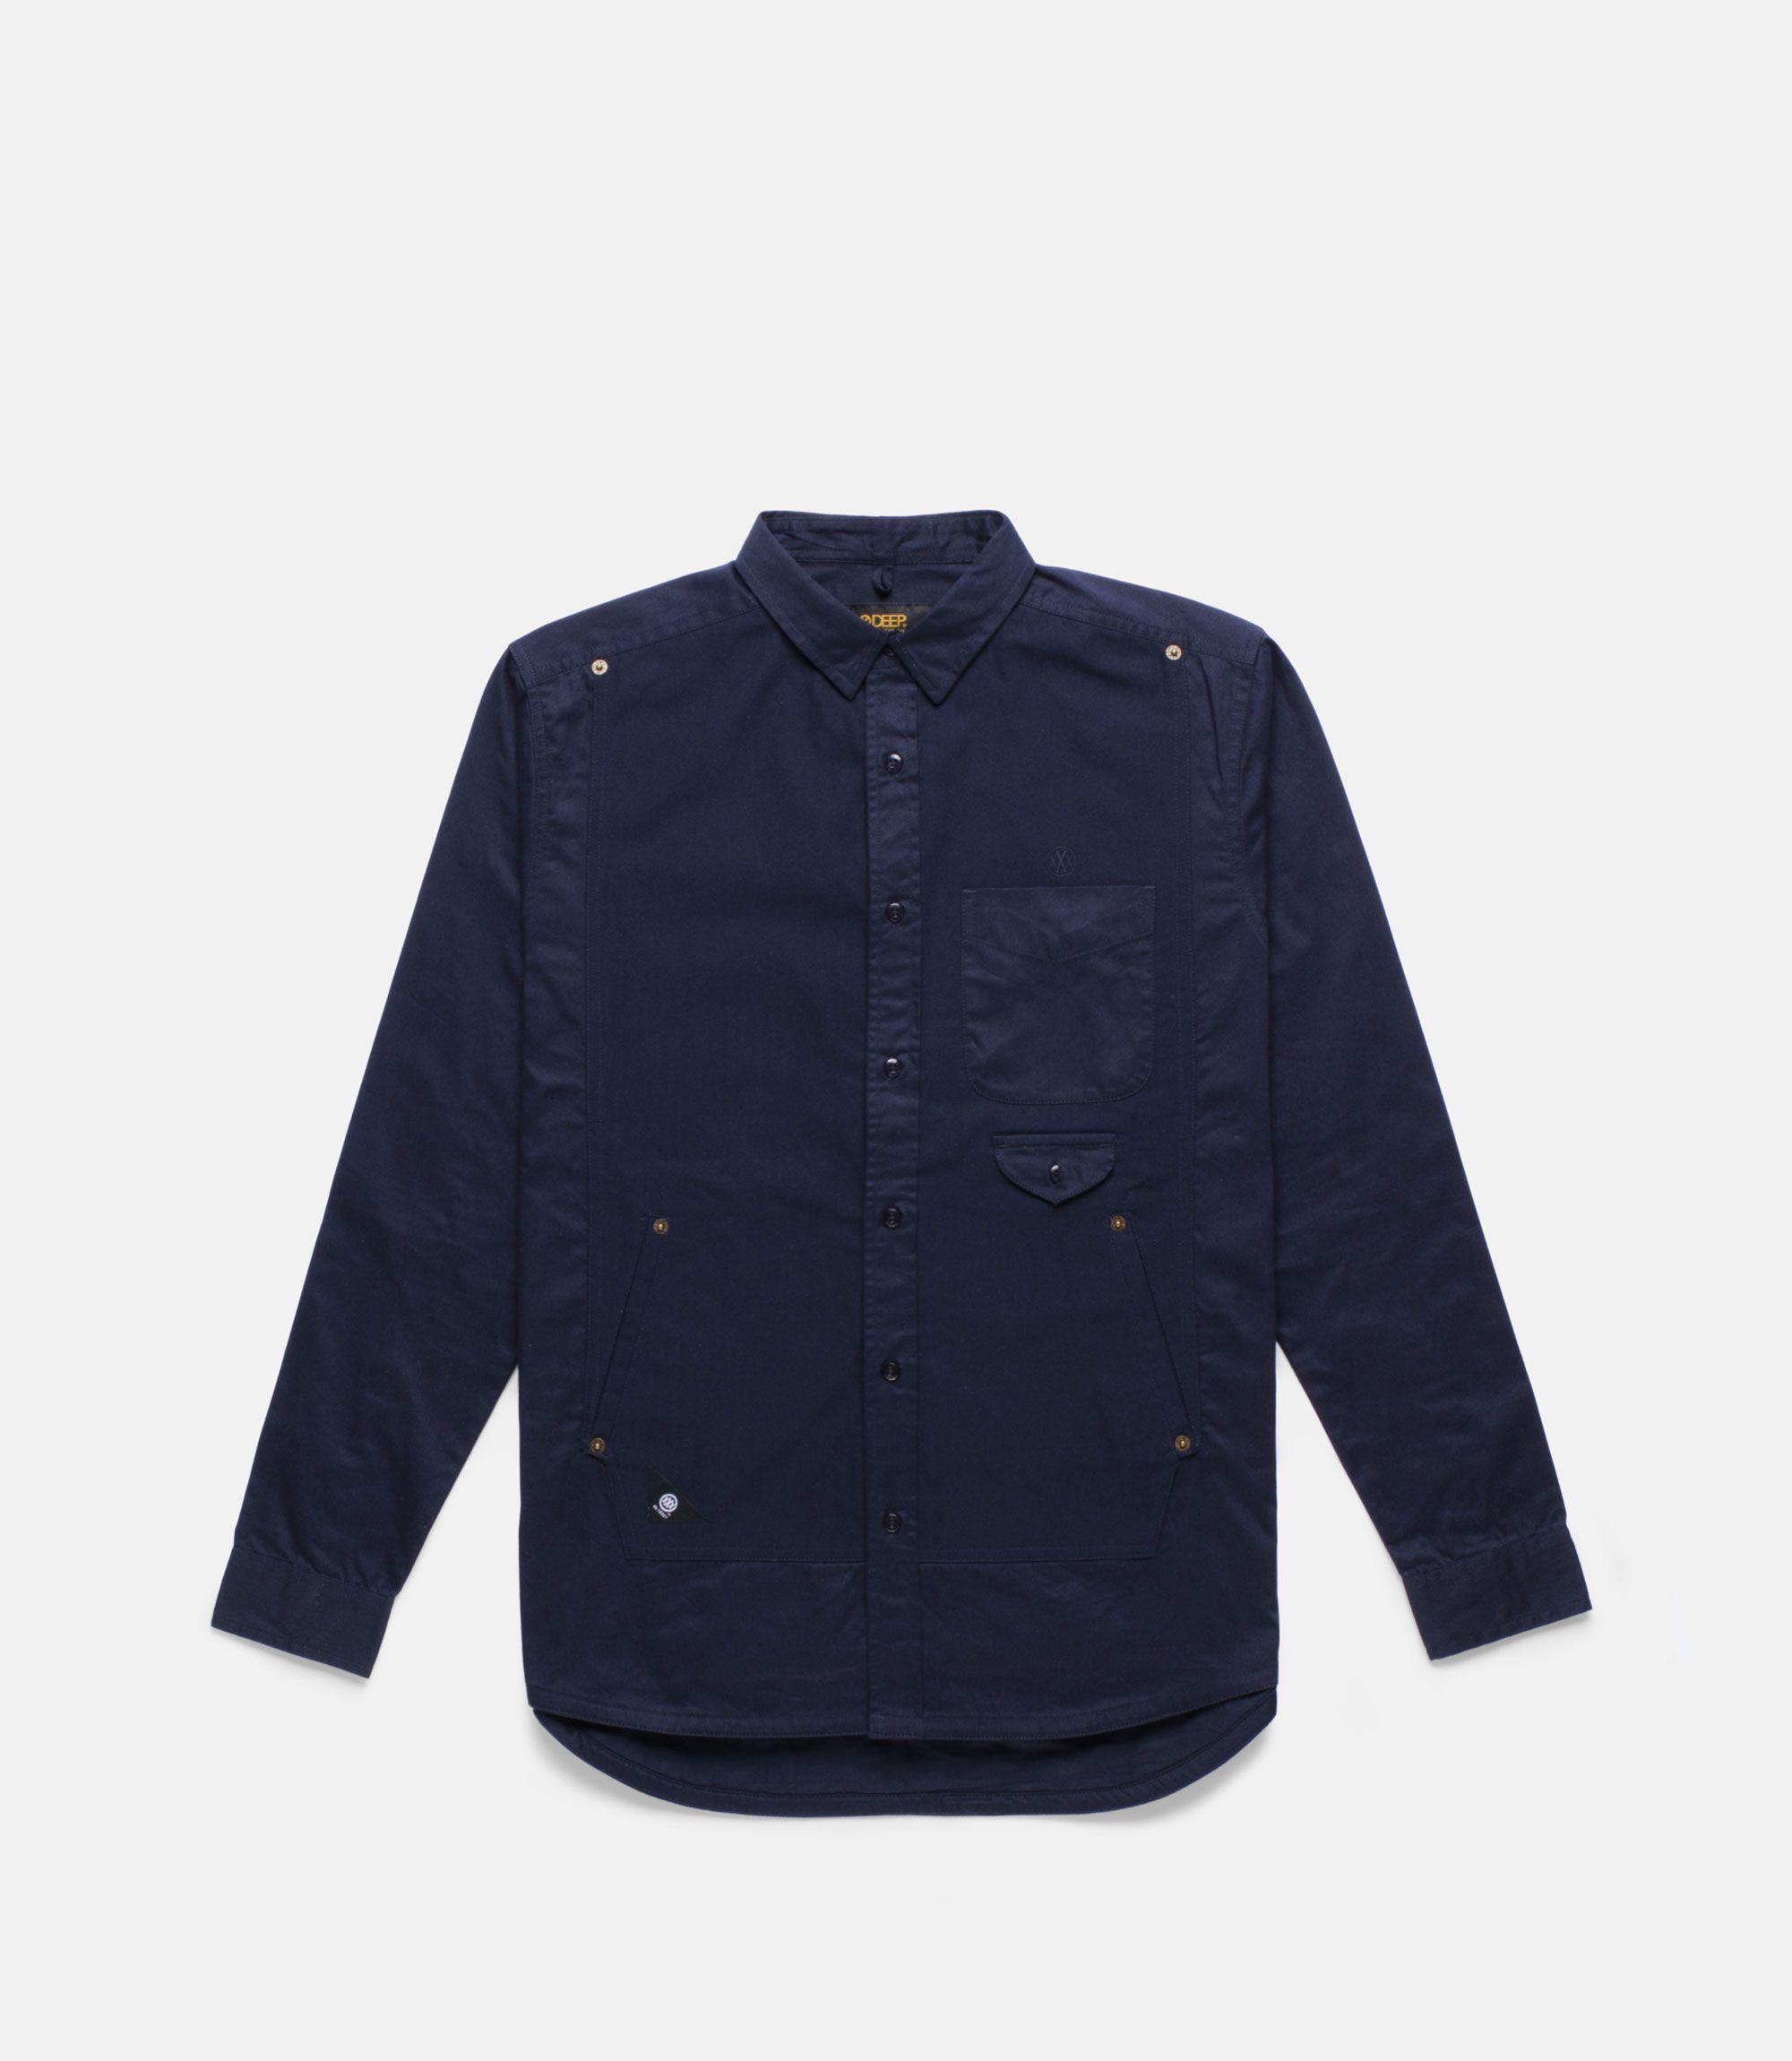 Carpenter Shirt Navy Carpenters Shirts 10 Deep Clothing Shirts